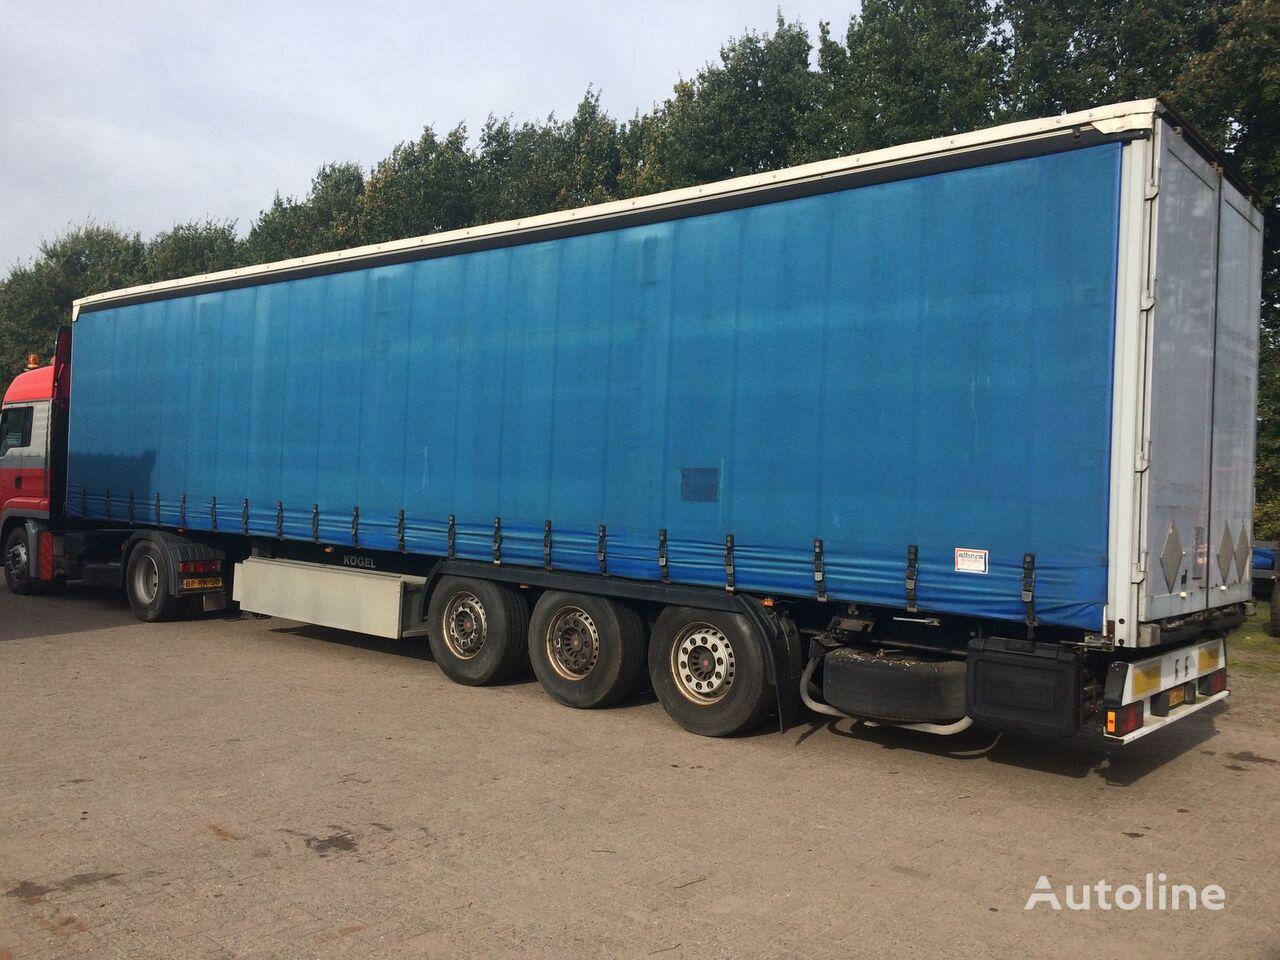 KÖGEL SN-24 curtain side semi-trailer